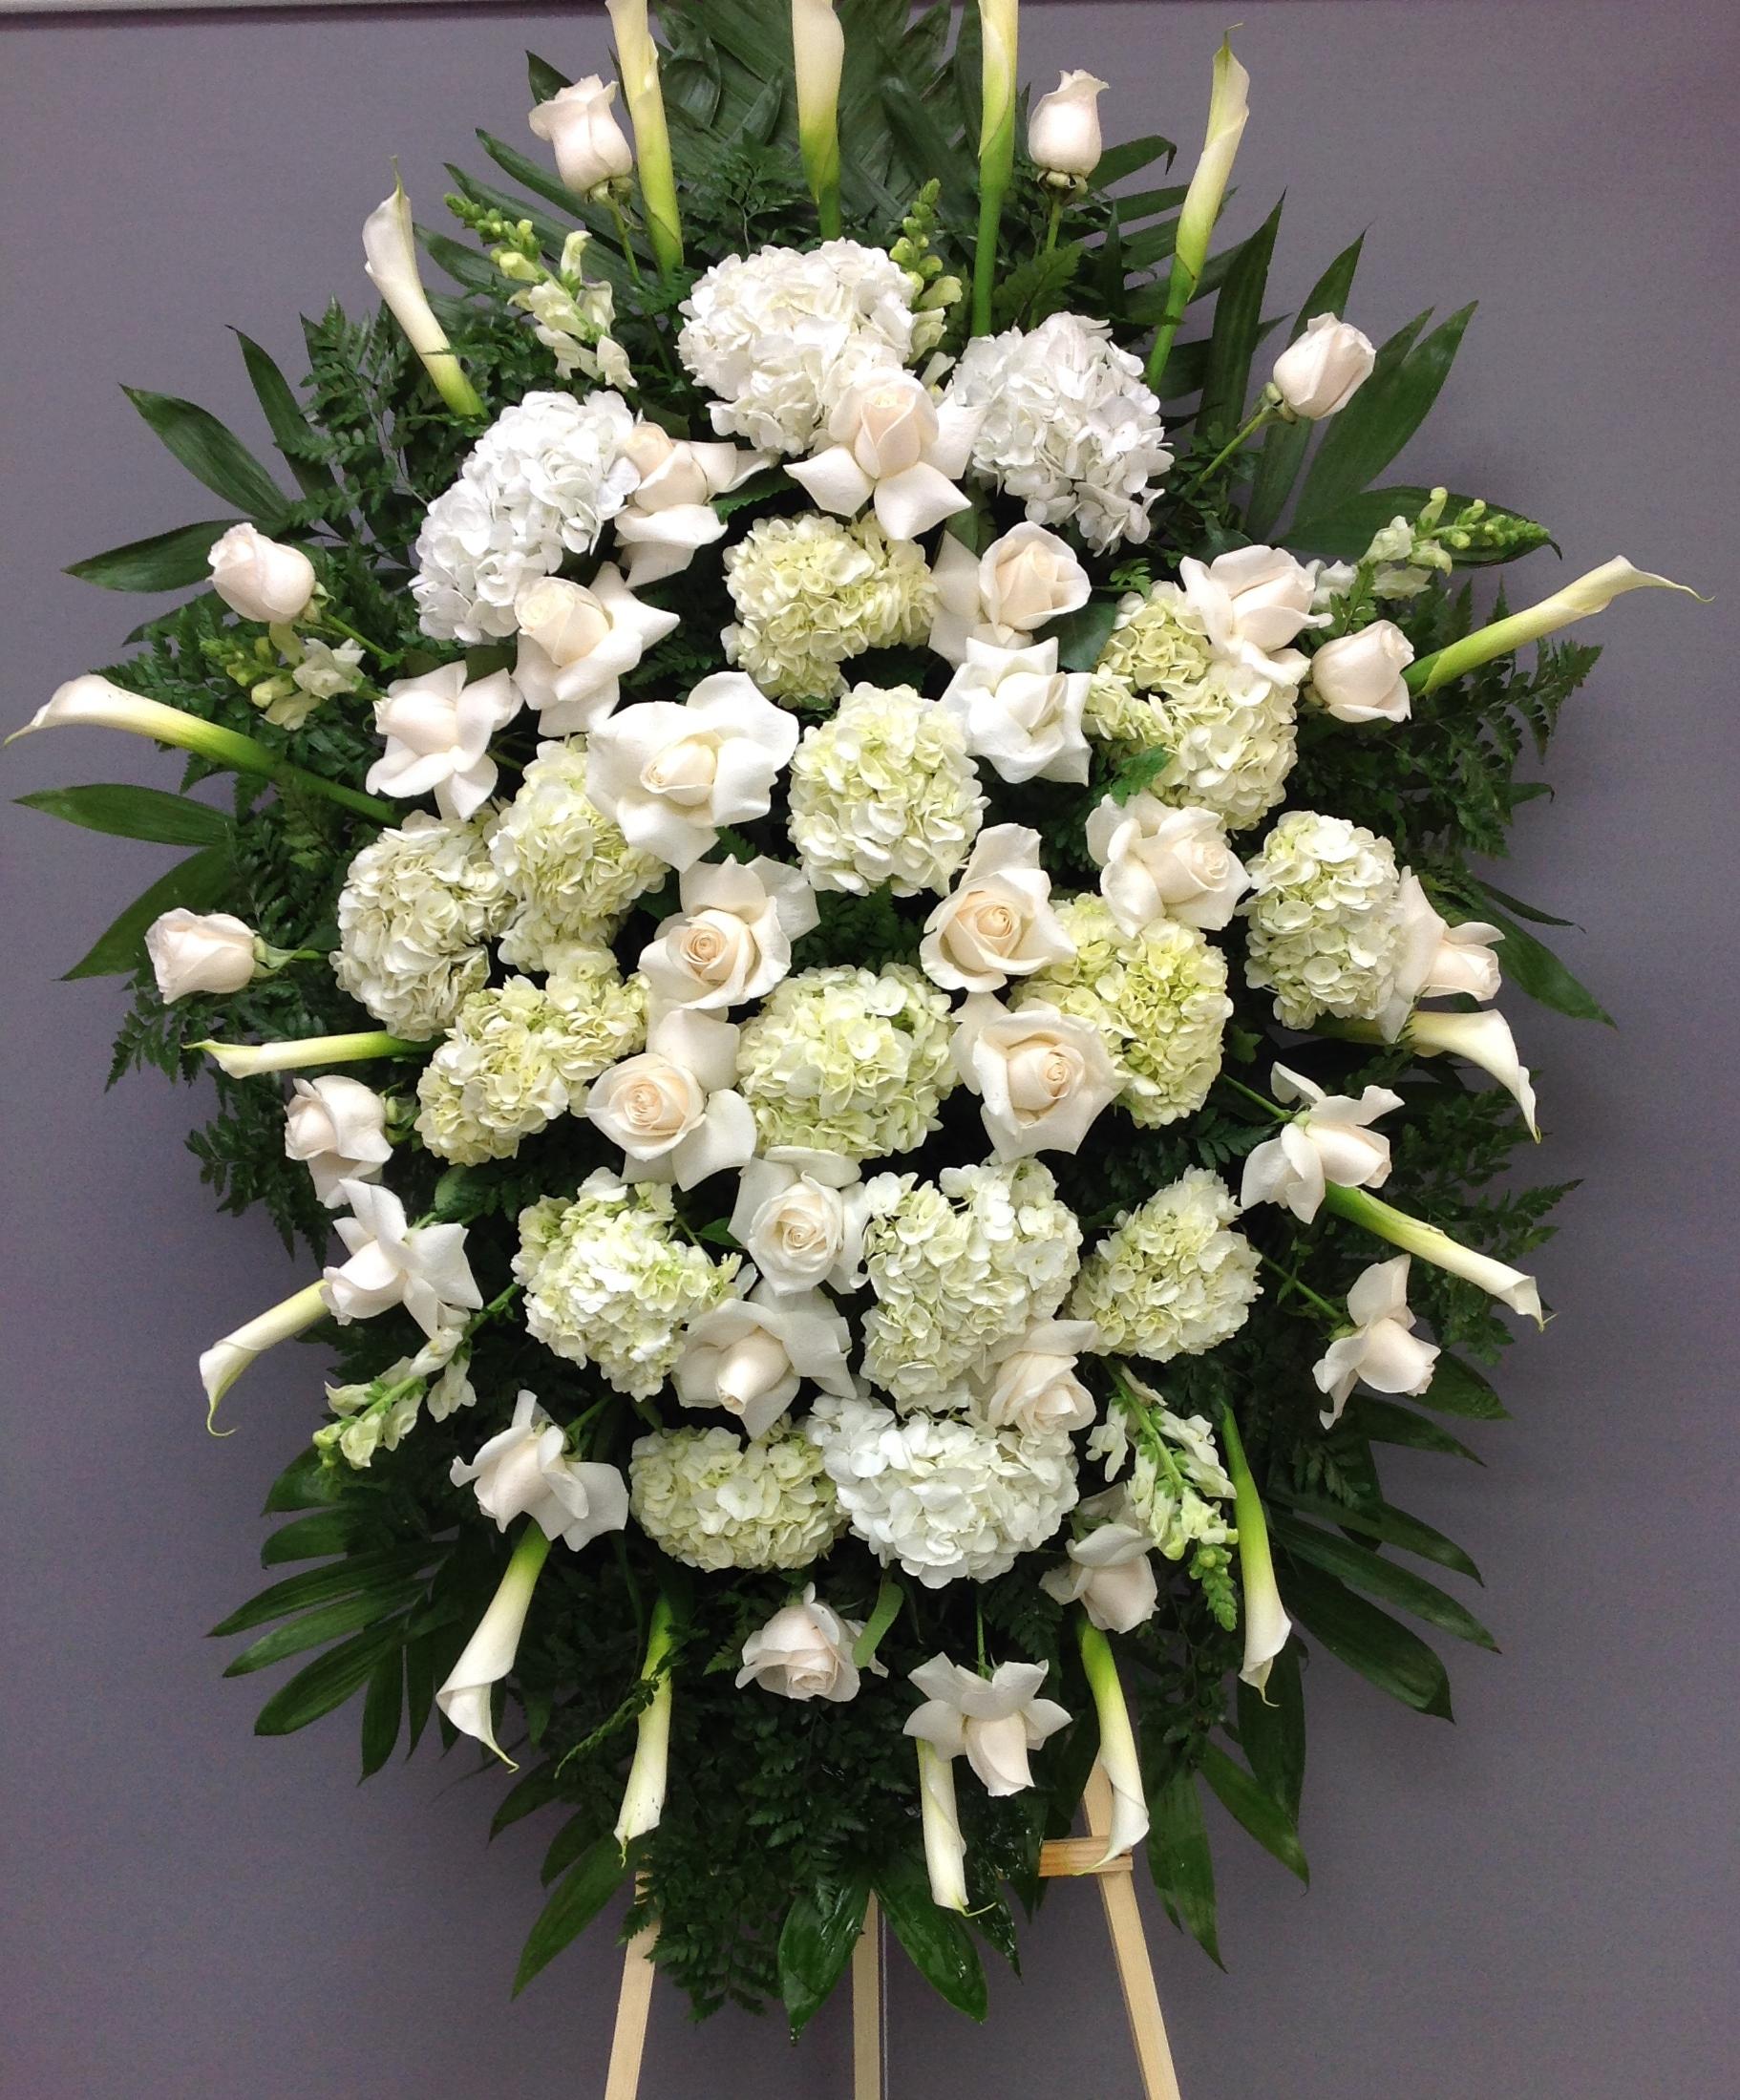 Funeral \u0026 Sympathy Flowers Glendale, CA | Funeral Arrangement